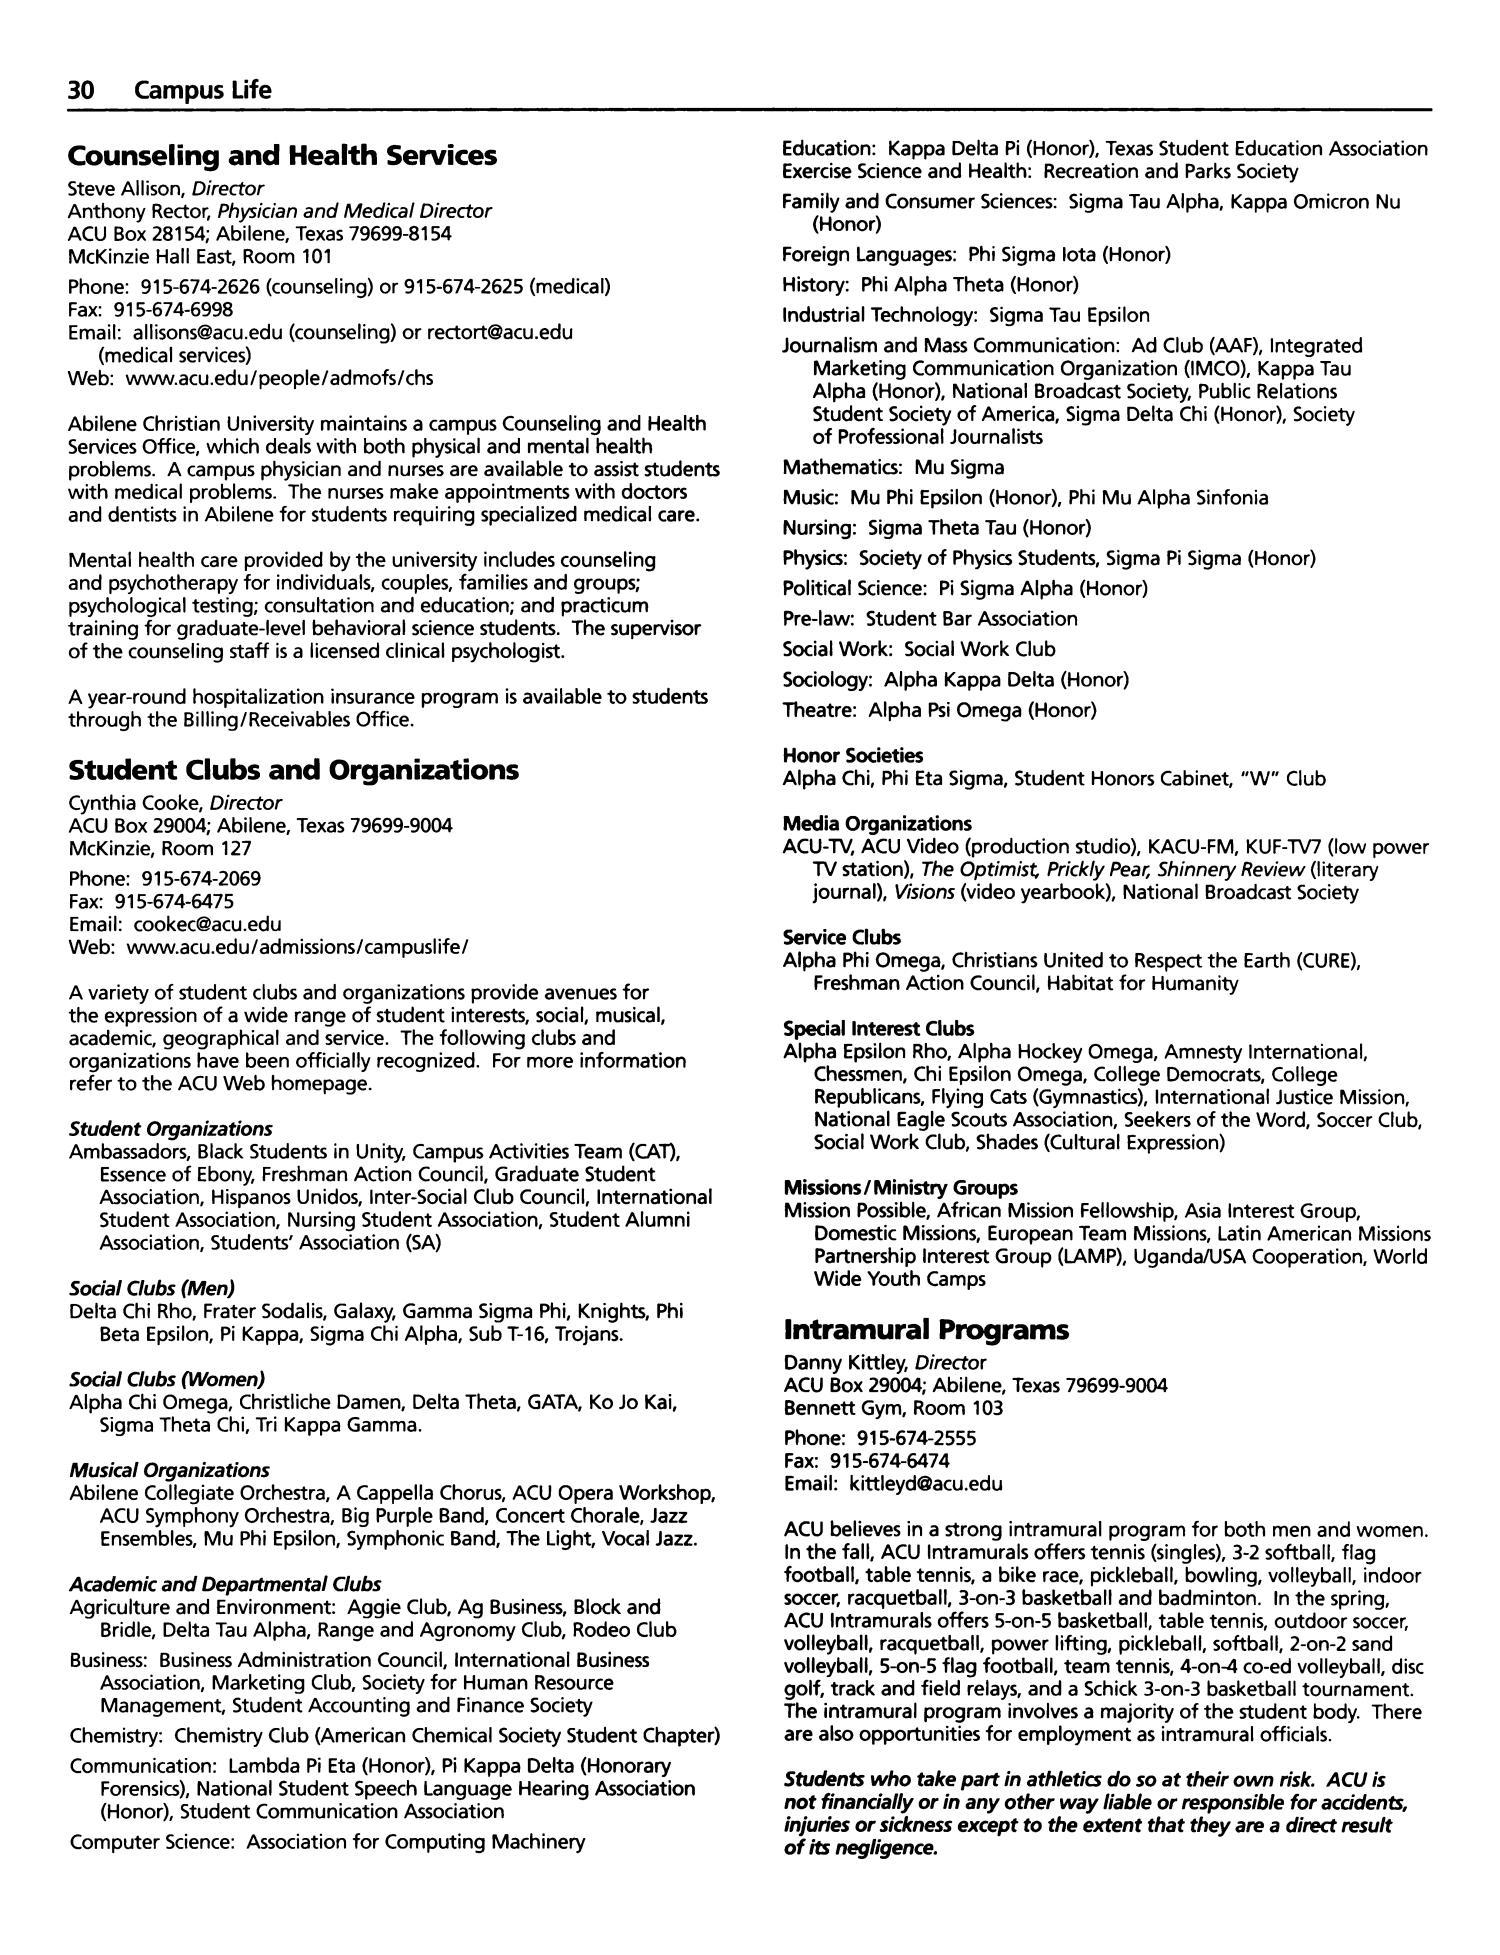 Catalog Of Abilene Christian University 2001 2002 Page 30 The